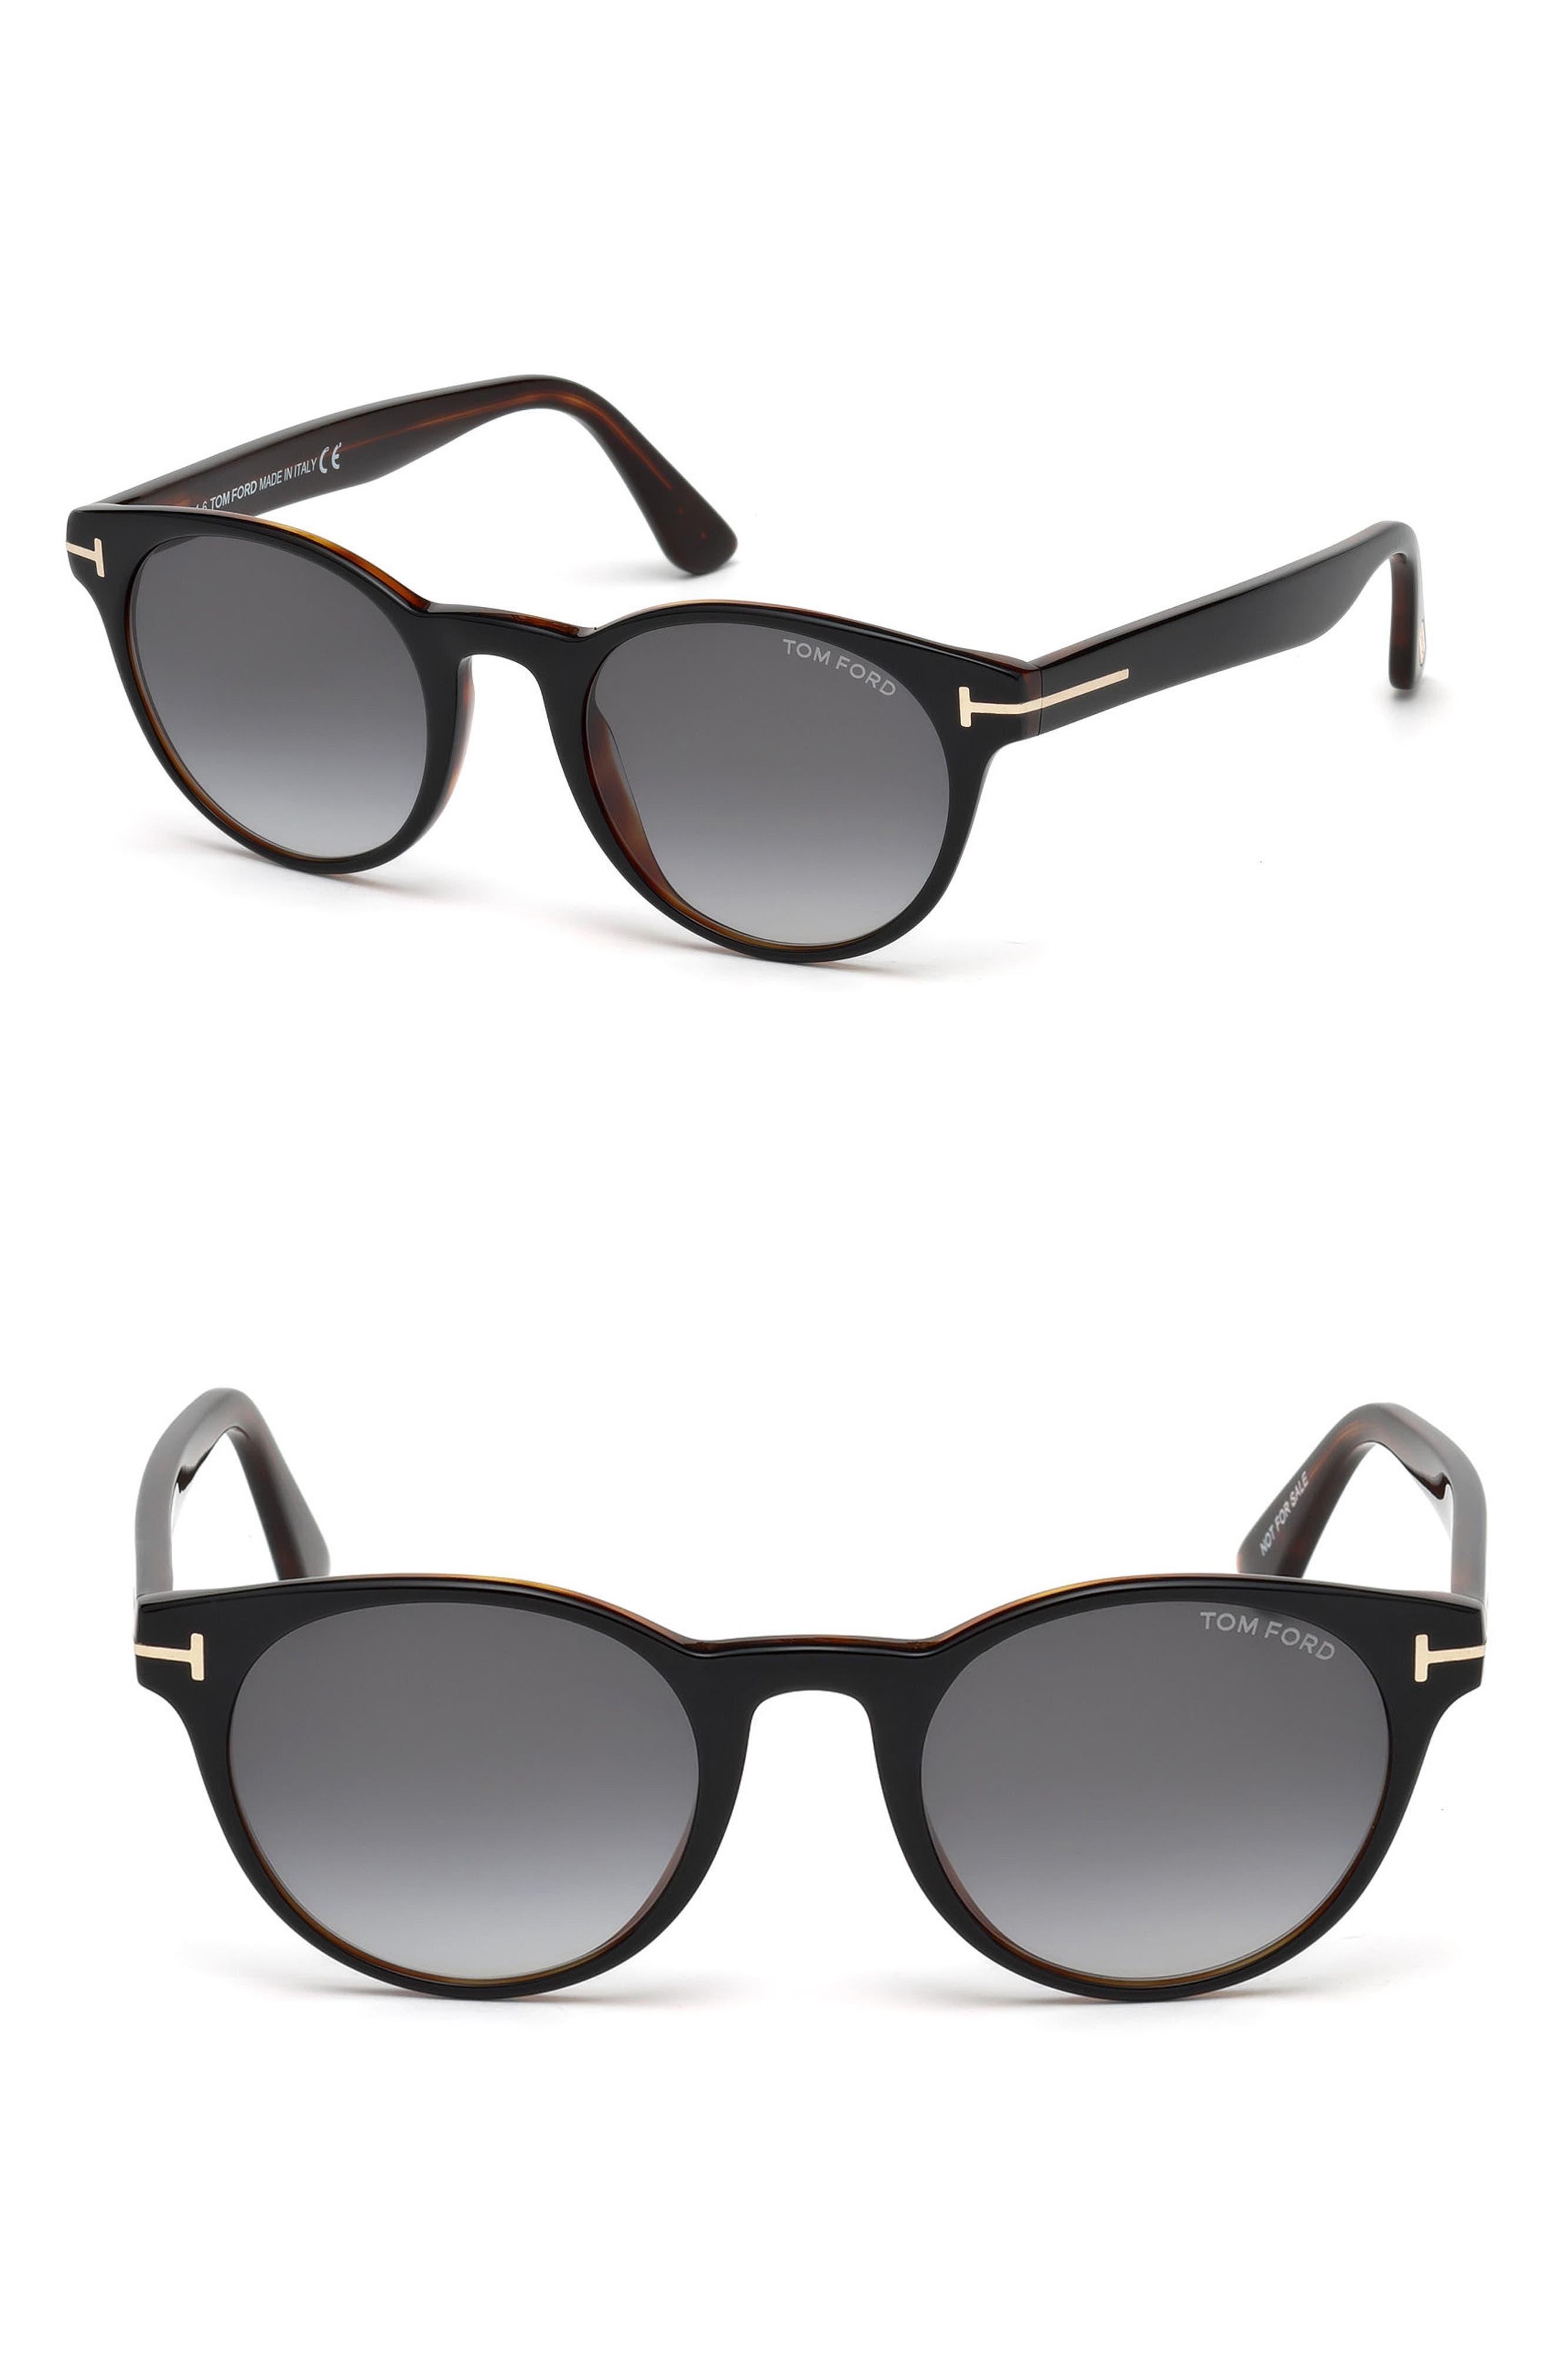 Palmer 51mm Polarized Sunglasses,                         Main,                         color, 017